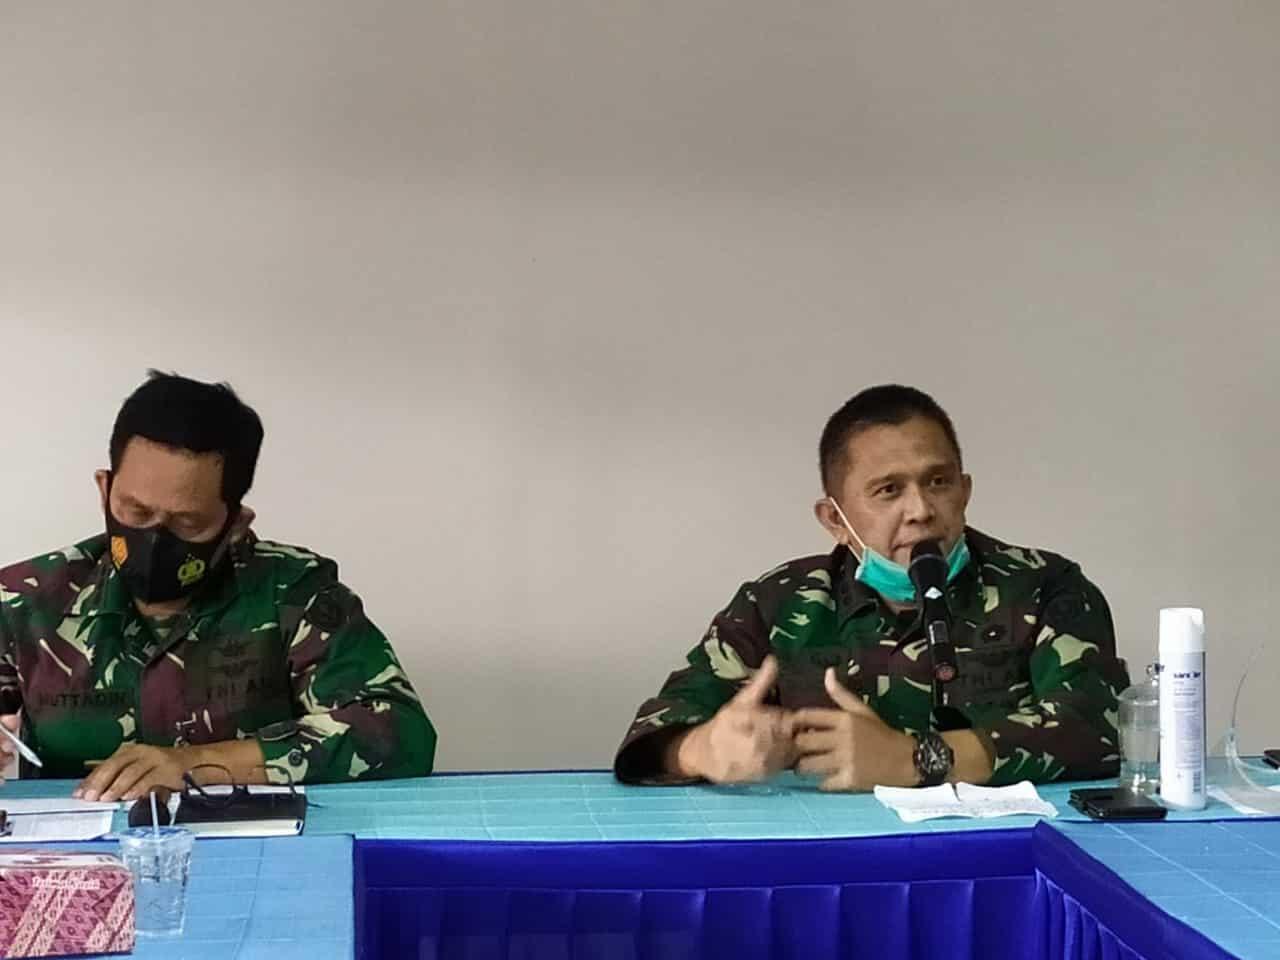 Tingkatkan Profesionalitas Tugas, Disbintalidau Gelar Pembekalan Perwira Bintal